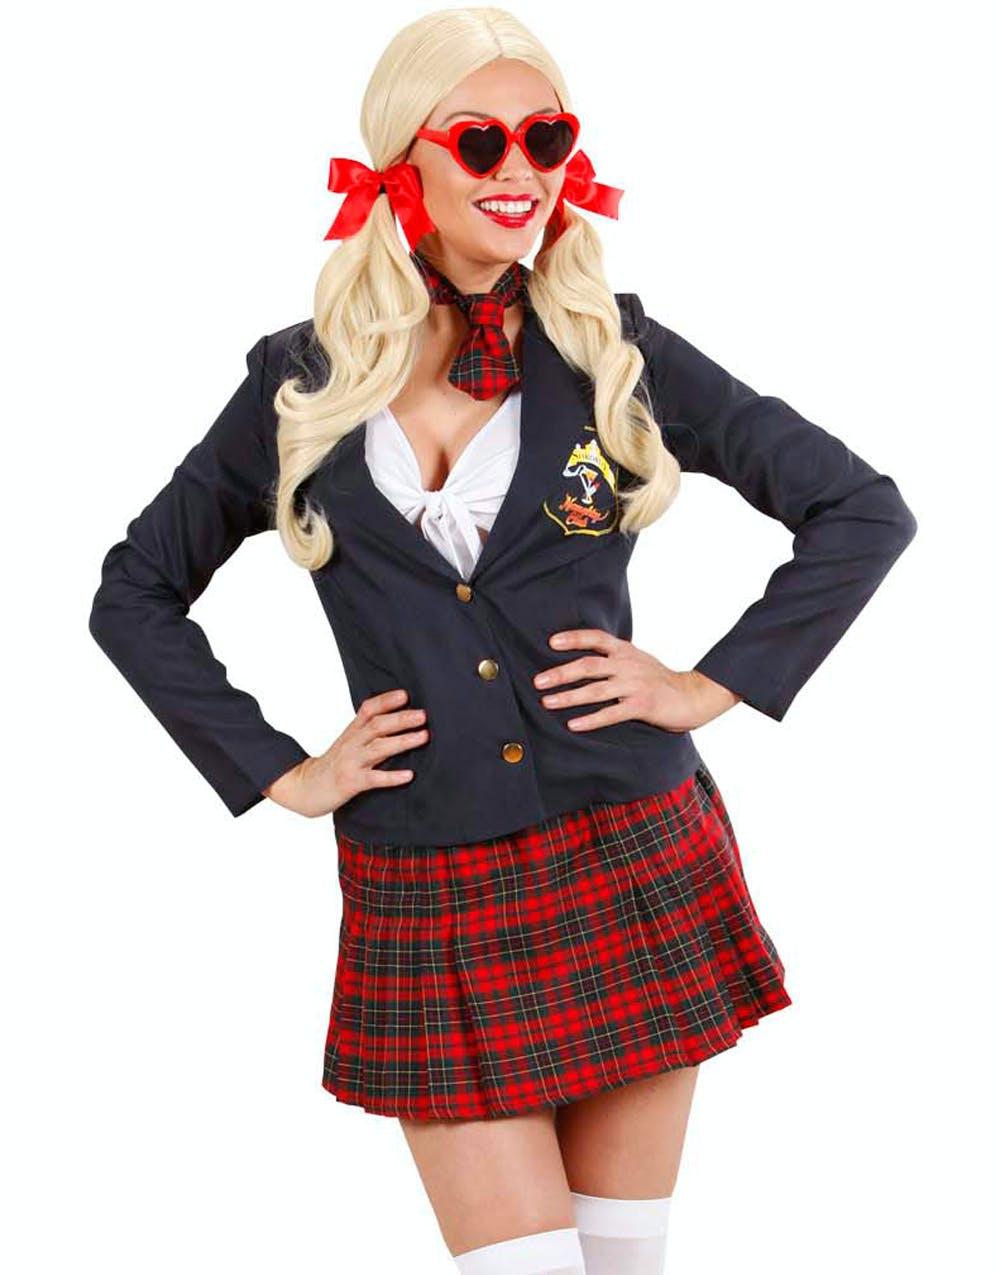 eskorte dame bergen skolepike kostyme